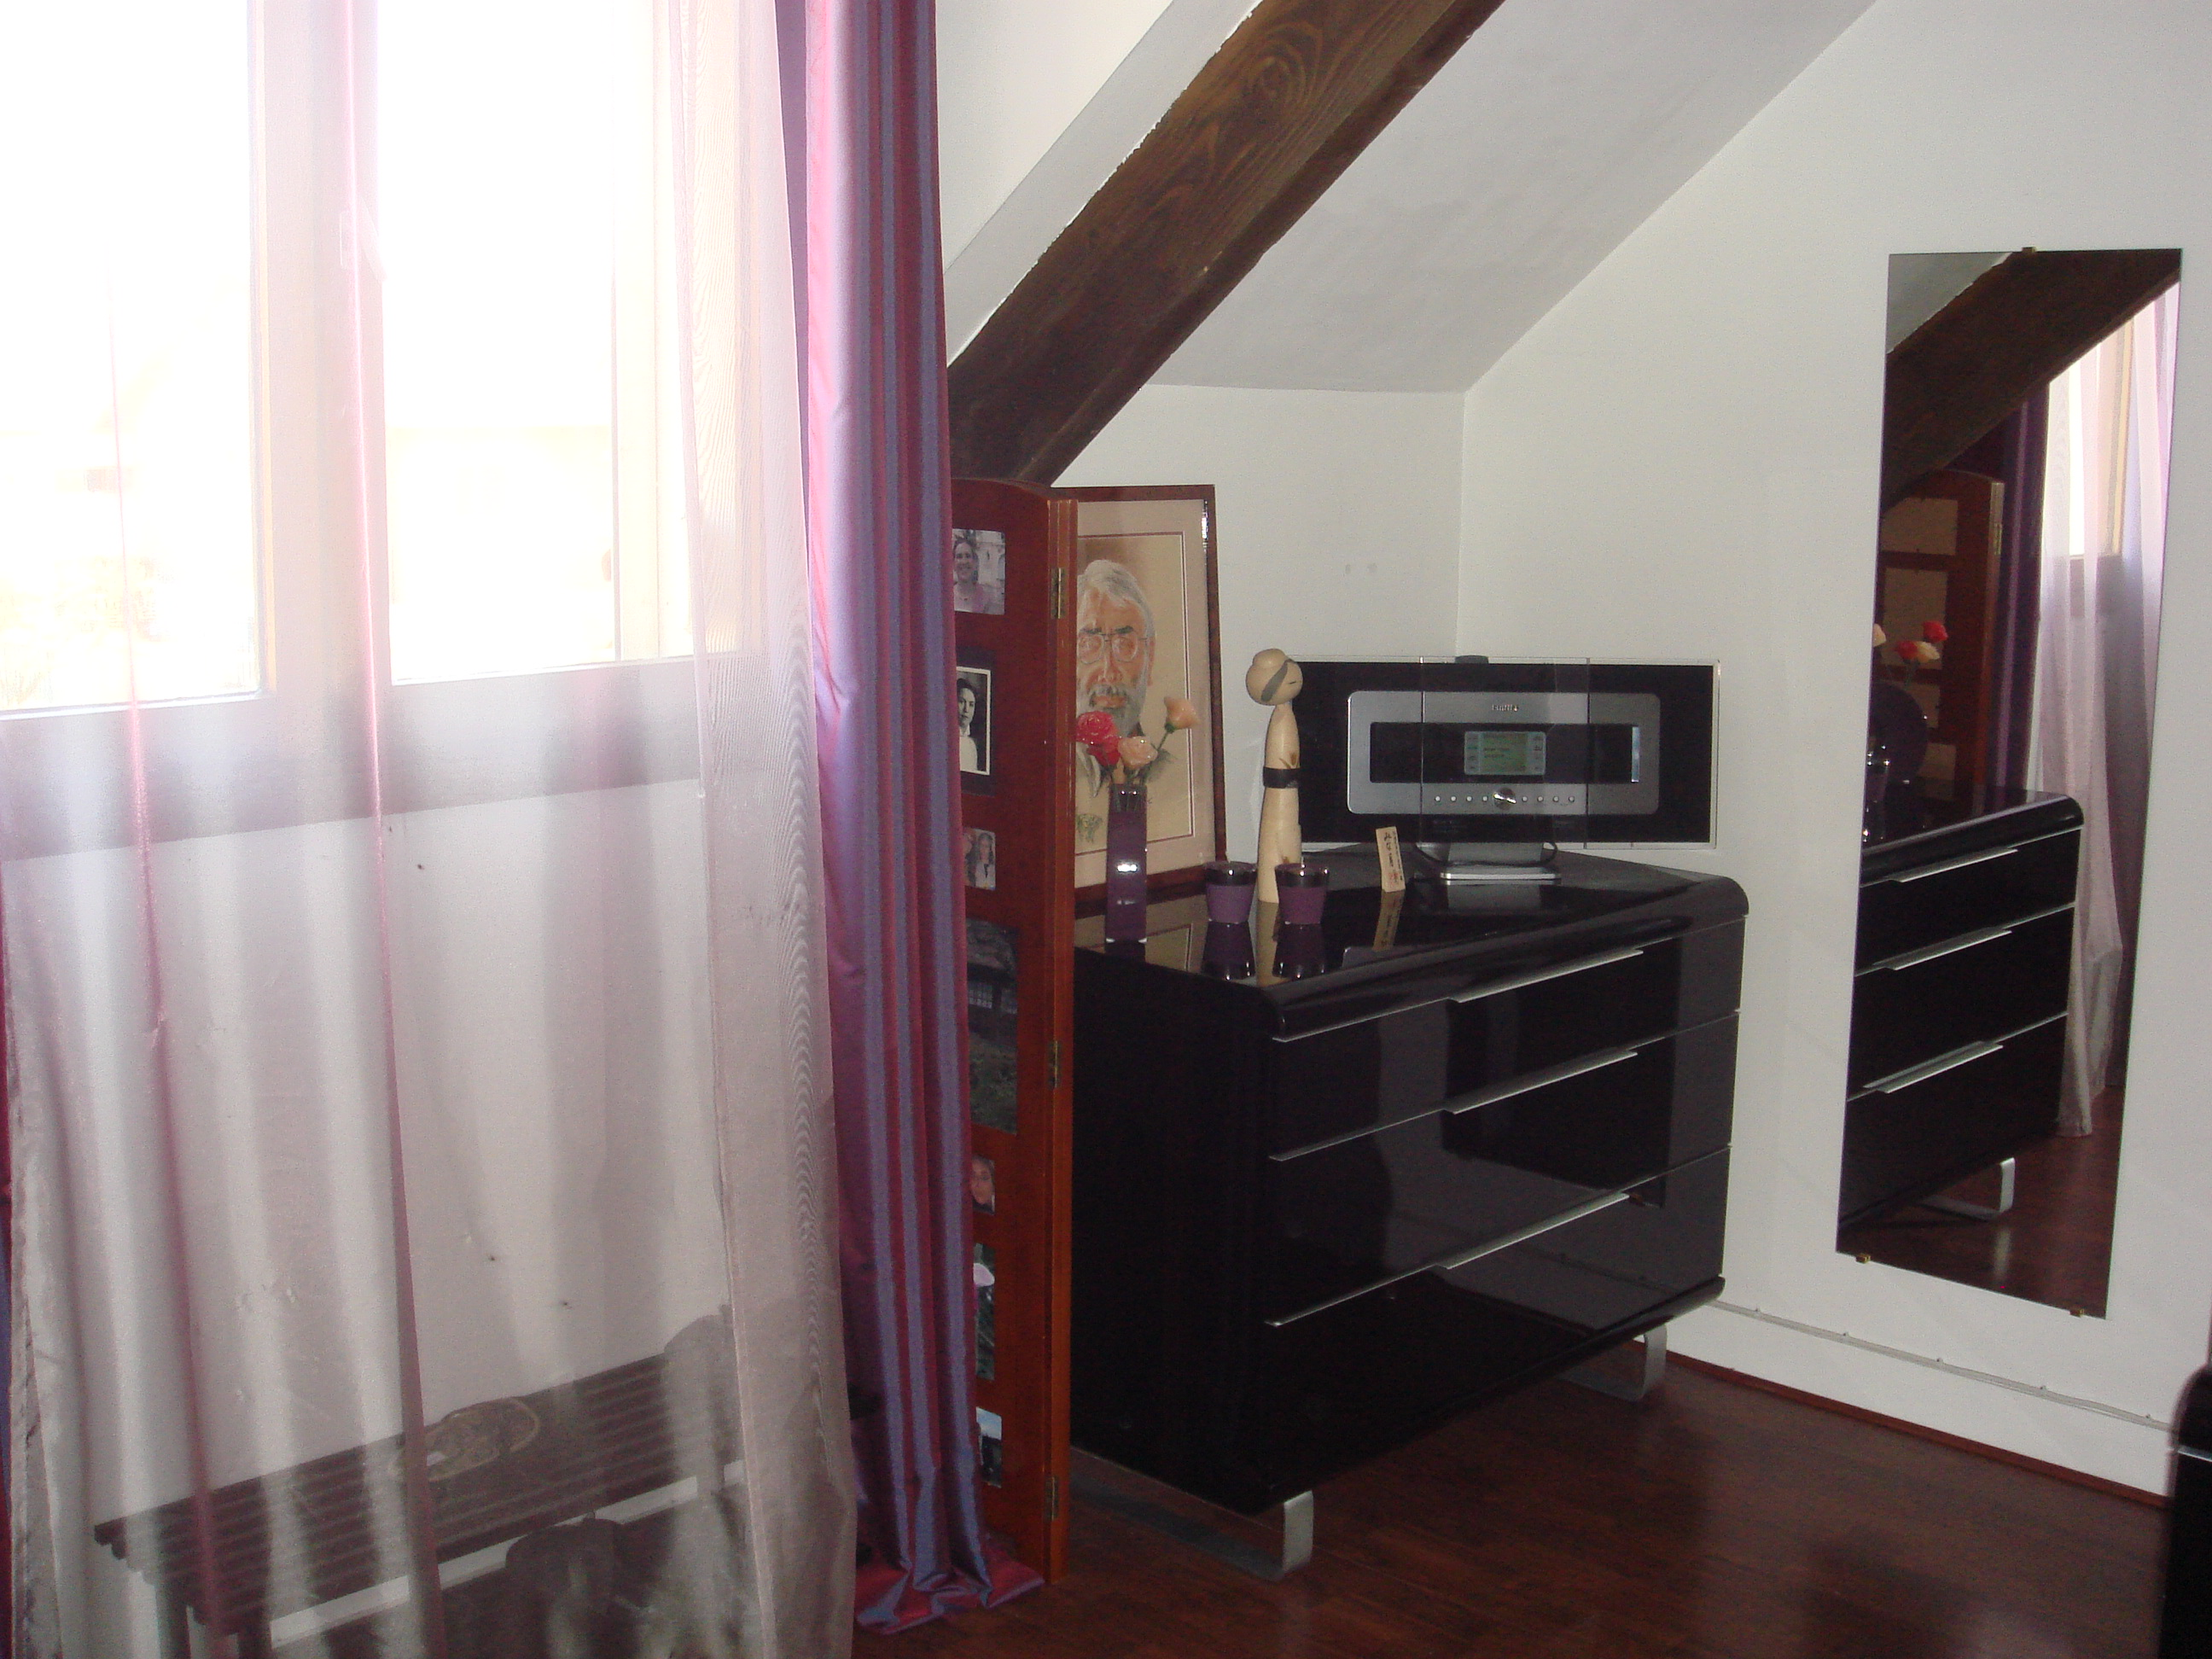 appartement triplex type maison de ville appartement triplex chilly mazarin. Black Bedroom Furniture Sets. Home Design Ideas